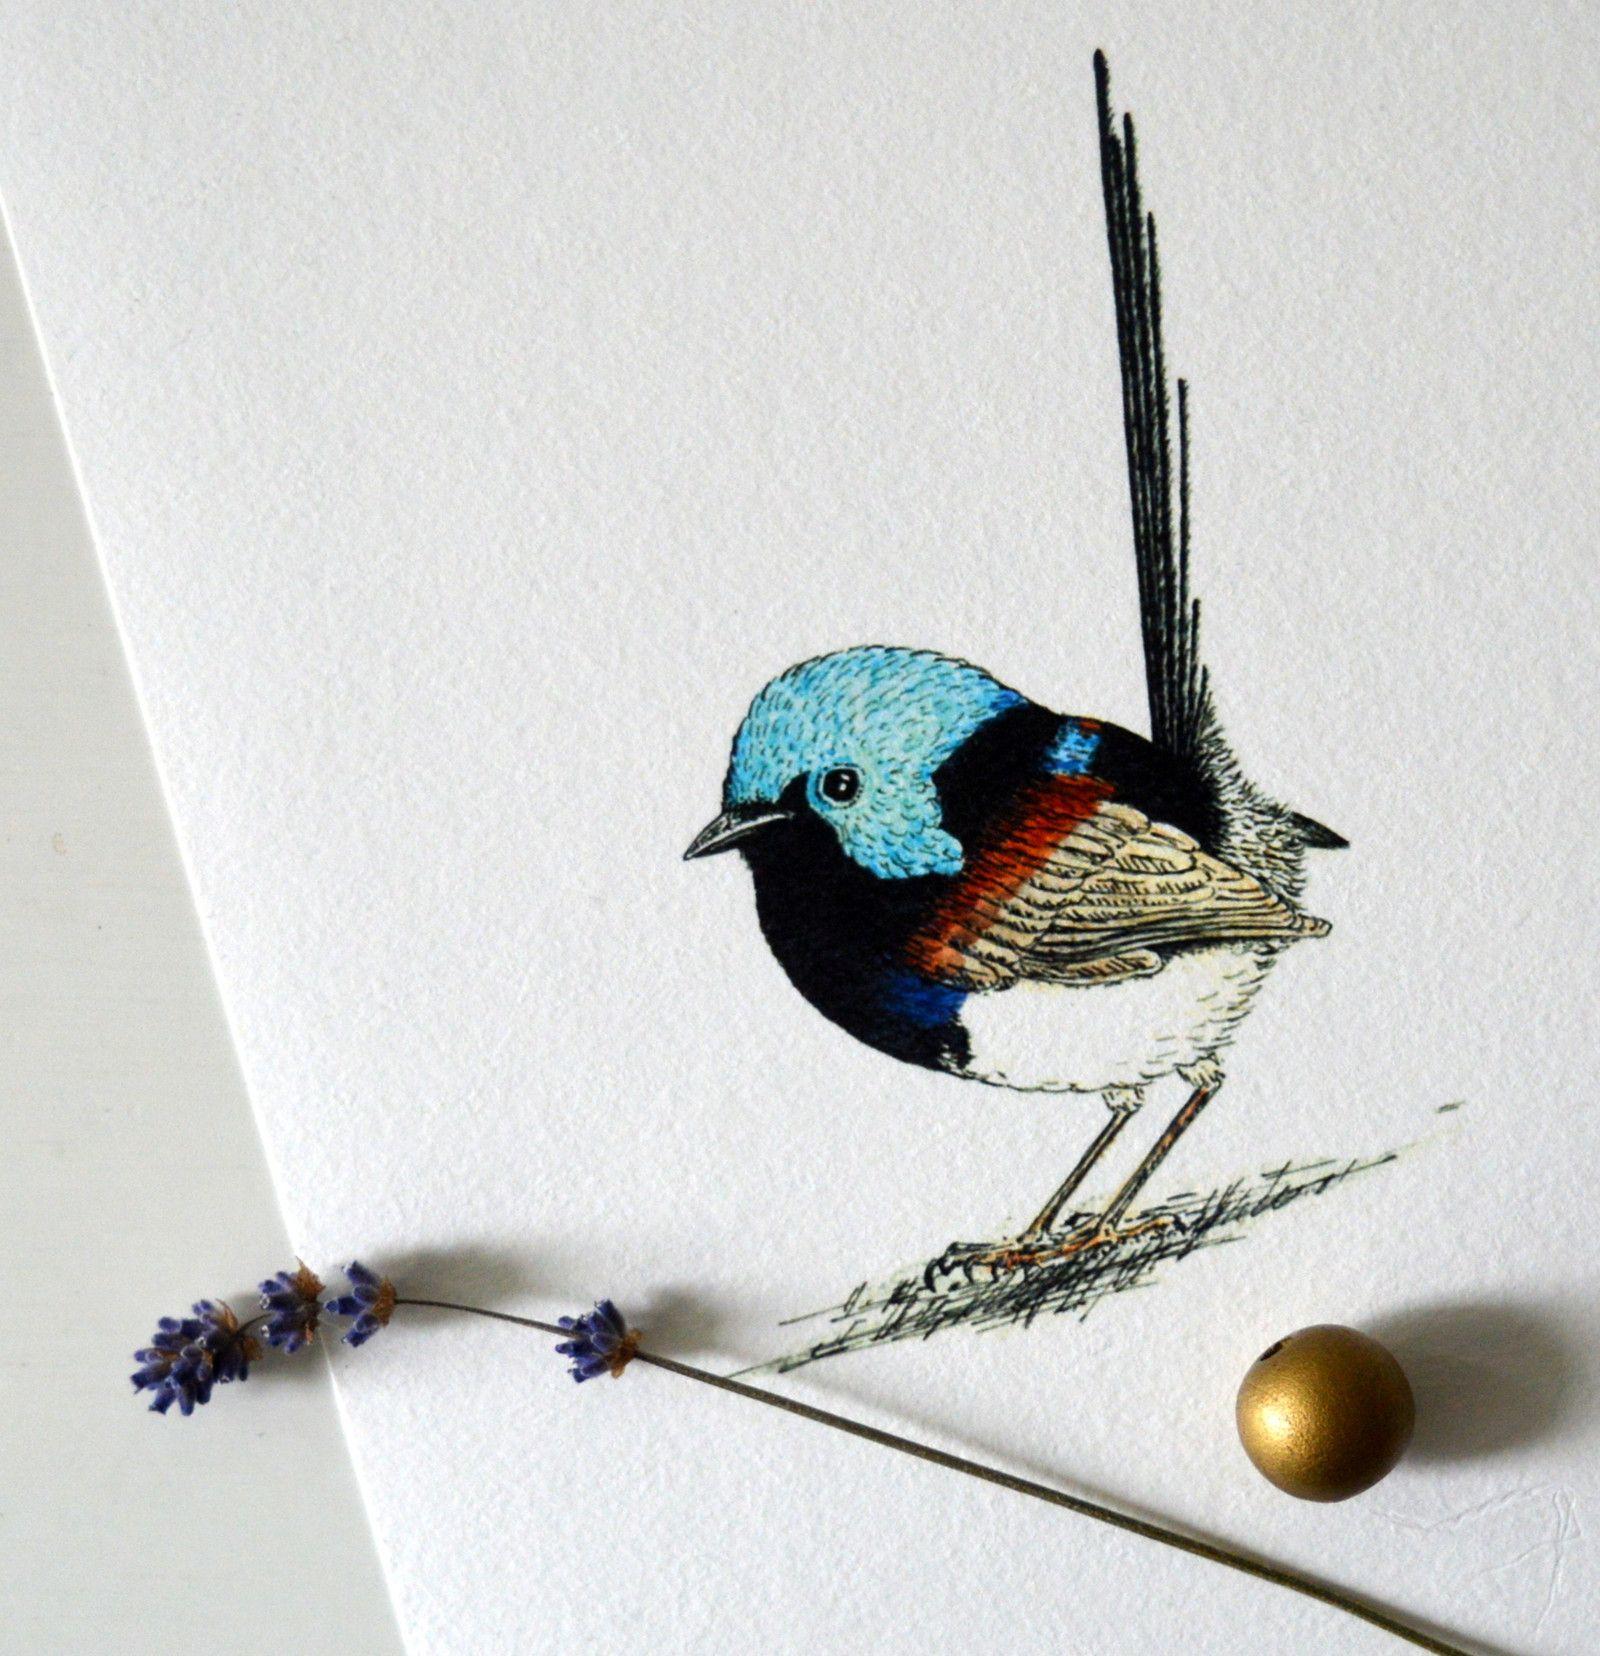 Modroplastnik Promenlivy Reprodukce Autorske Kresby Tusi A